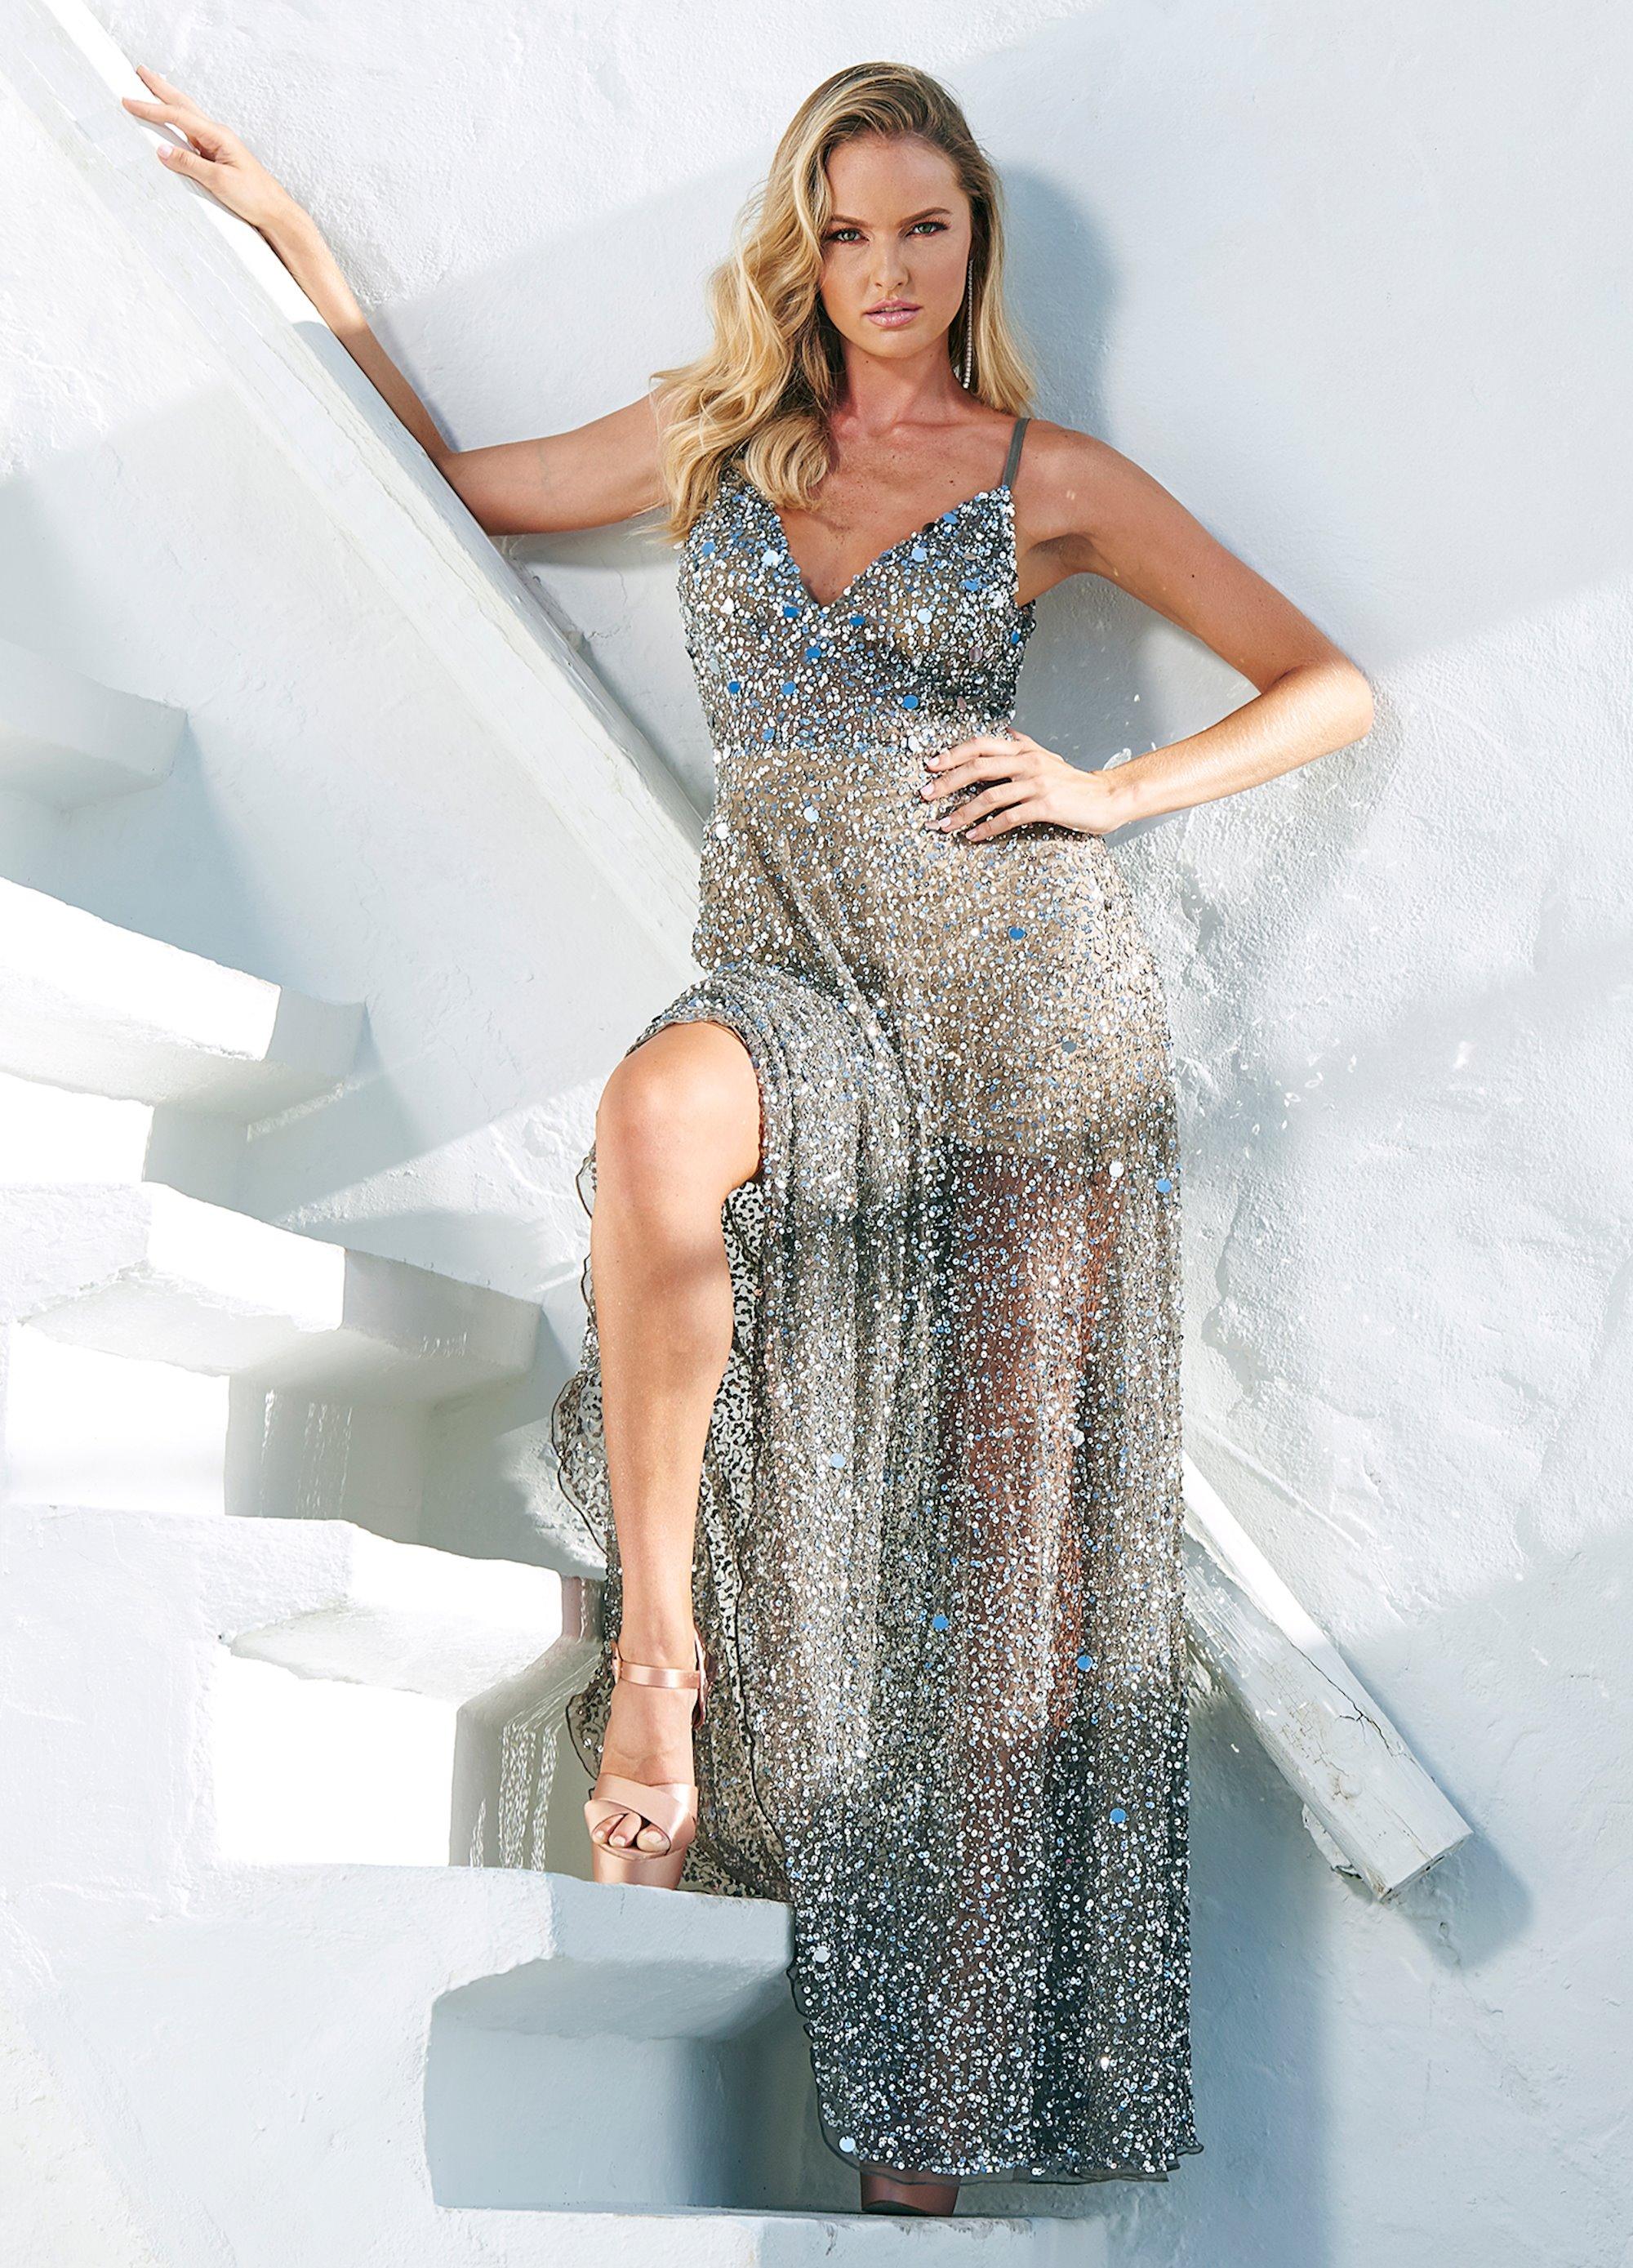 f09758a65041 Ashley Lauren - Fully Beaded A-Line Evening Dress | ASHLEYlauren